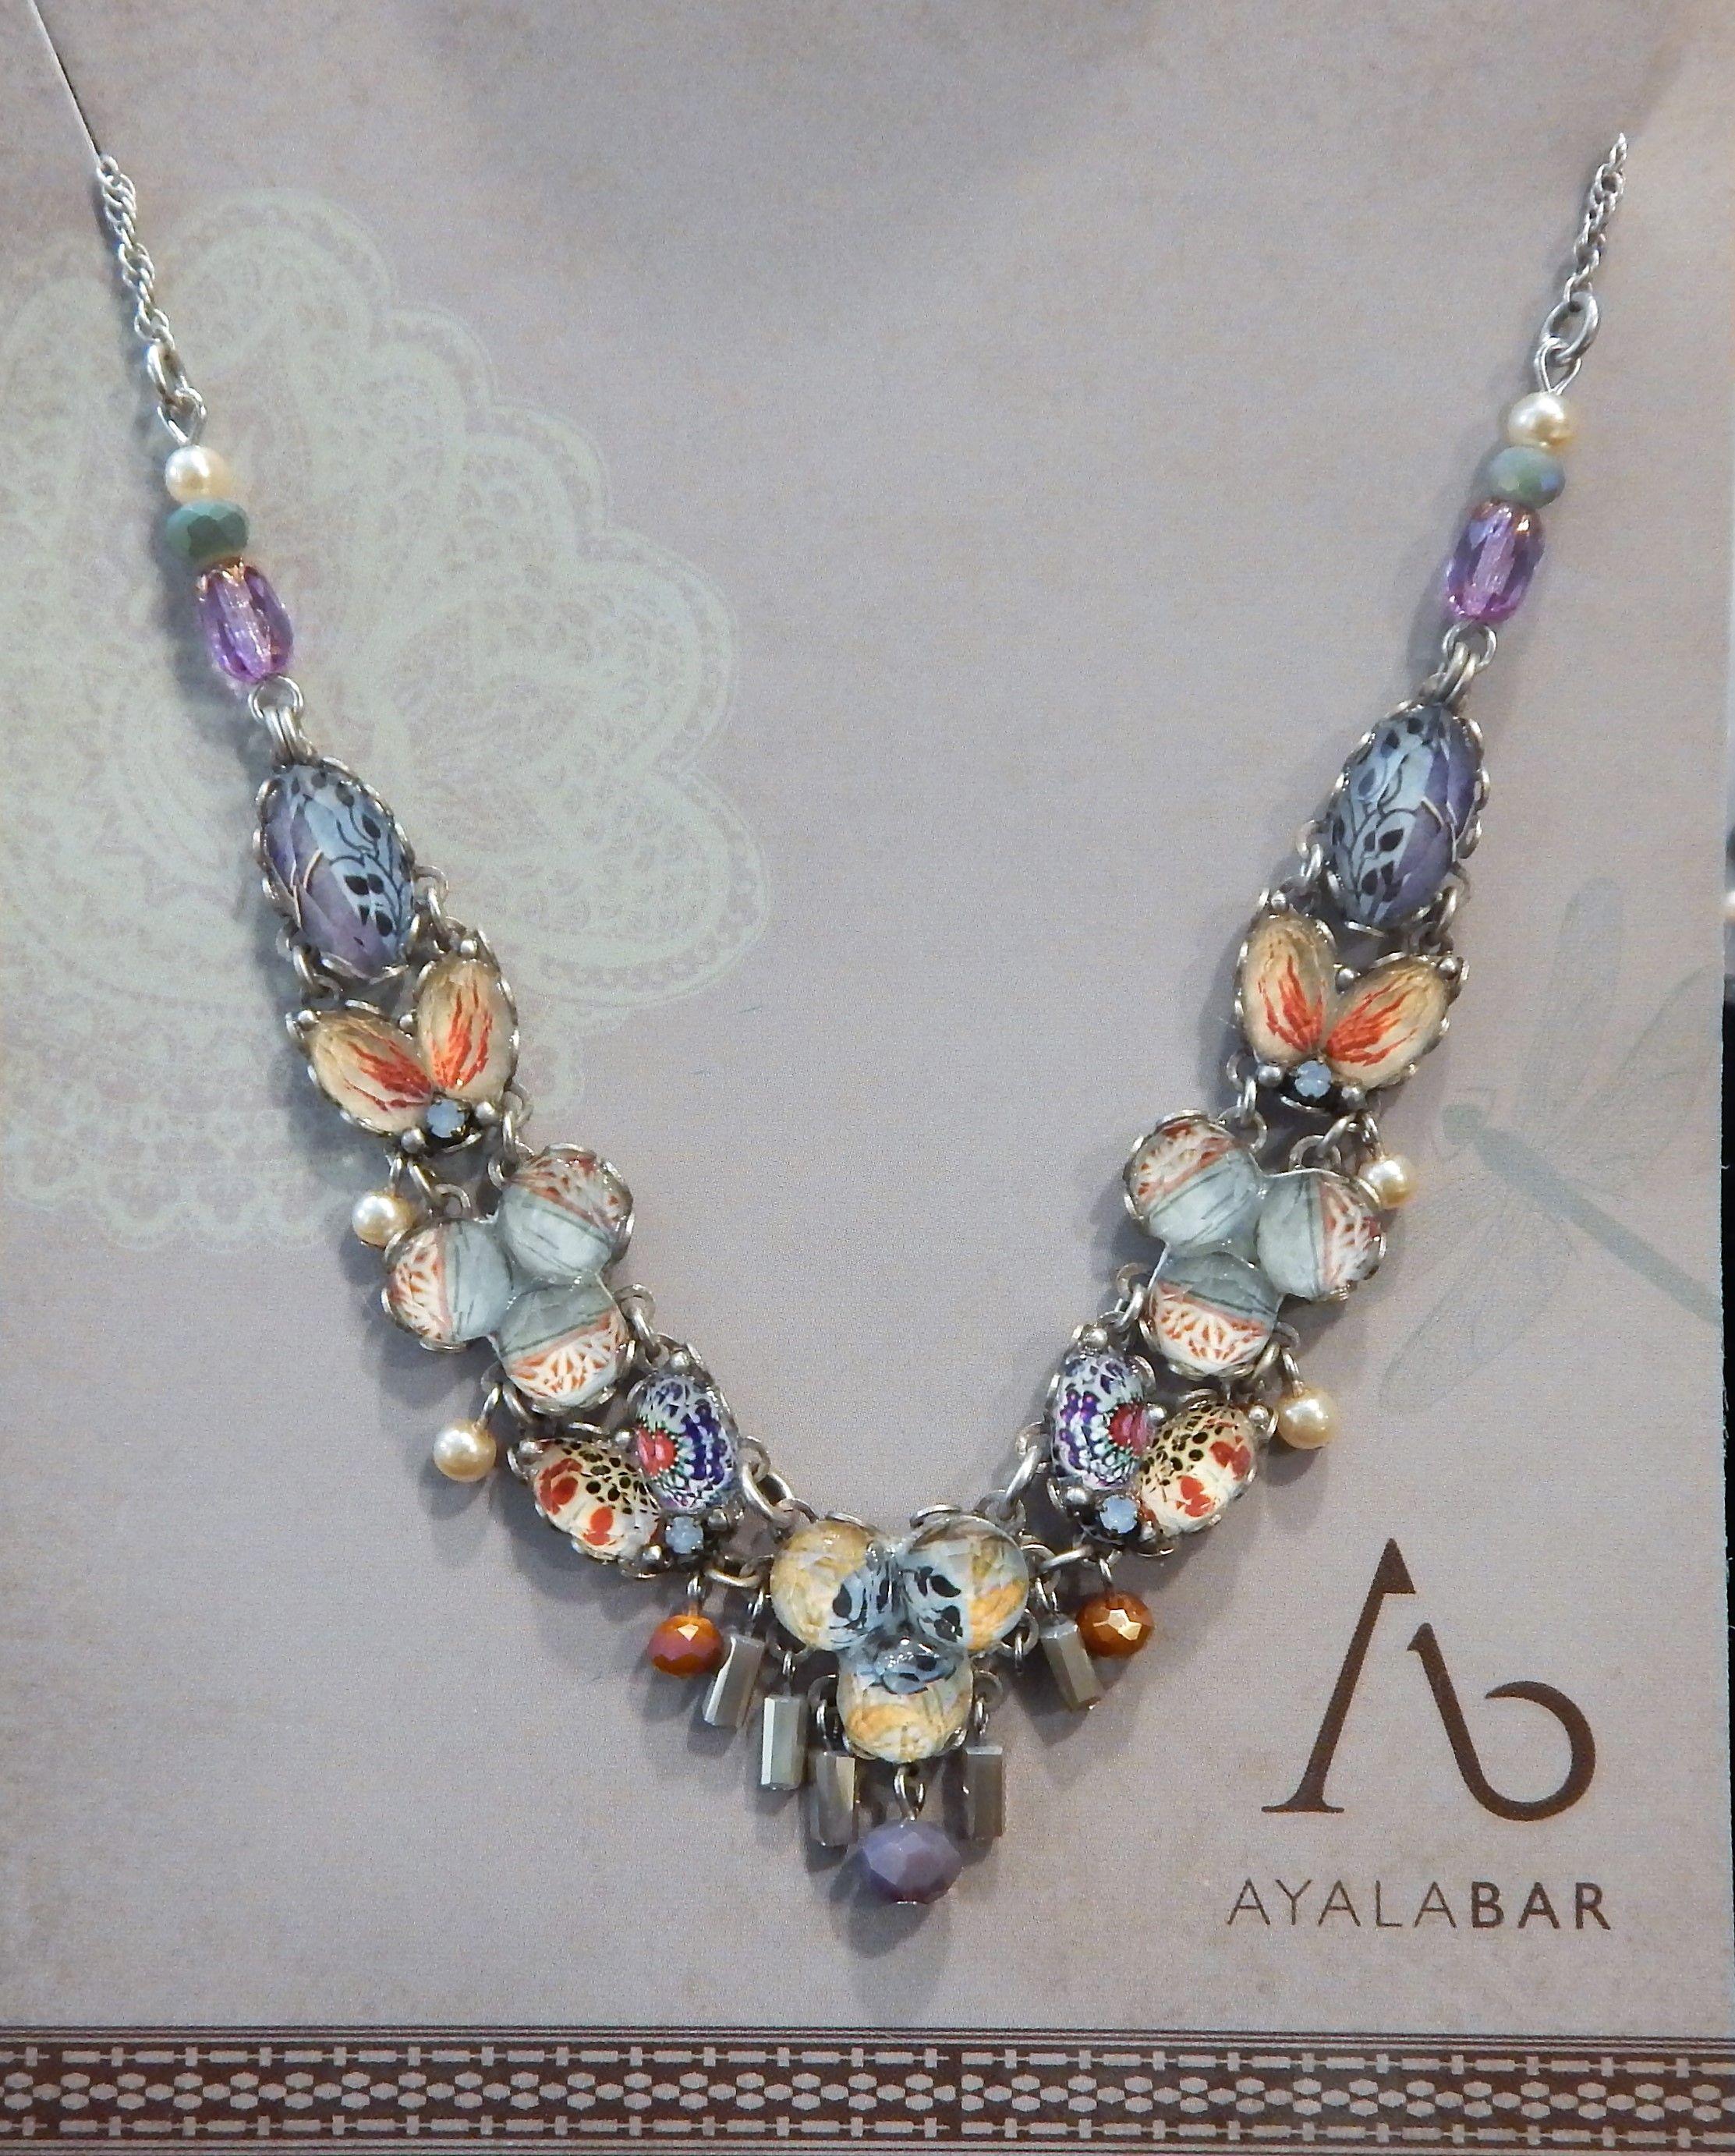 Ayala Bar Necklace Www Artisansnest Com With Images Bar Jewelry Beautiful Necklaces Gorgeous Jewelry